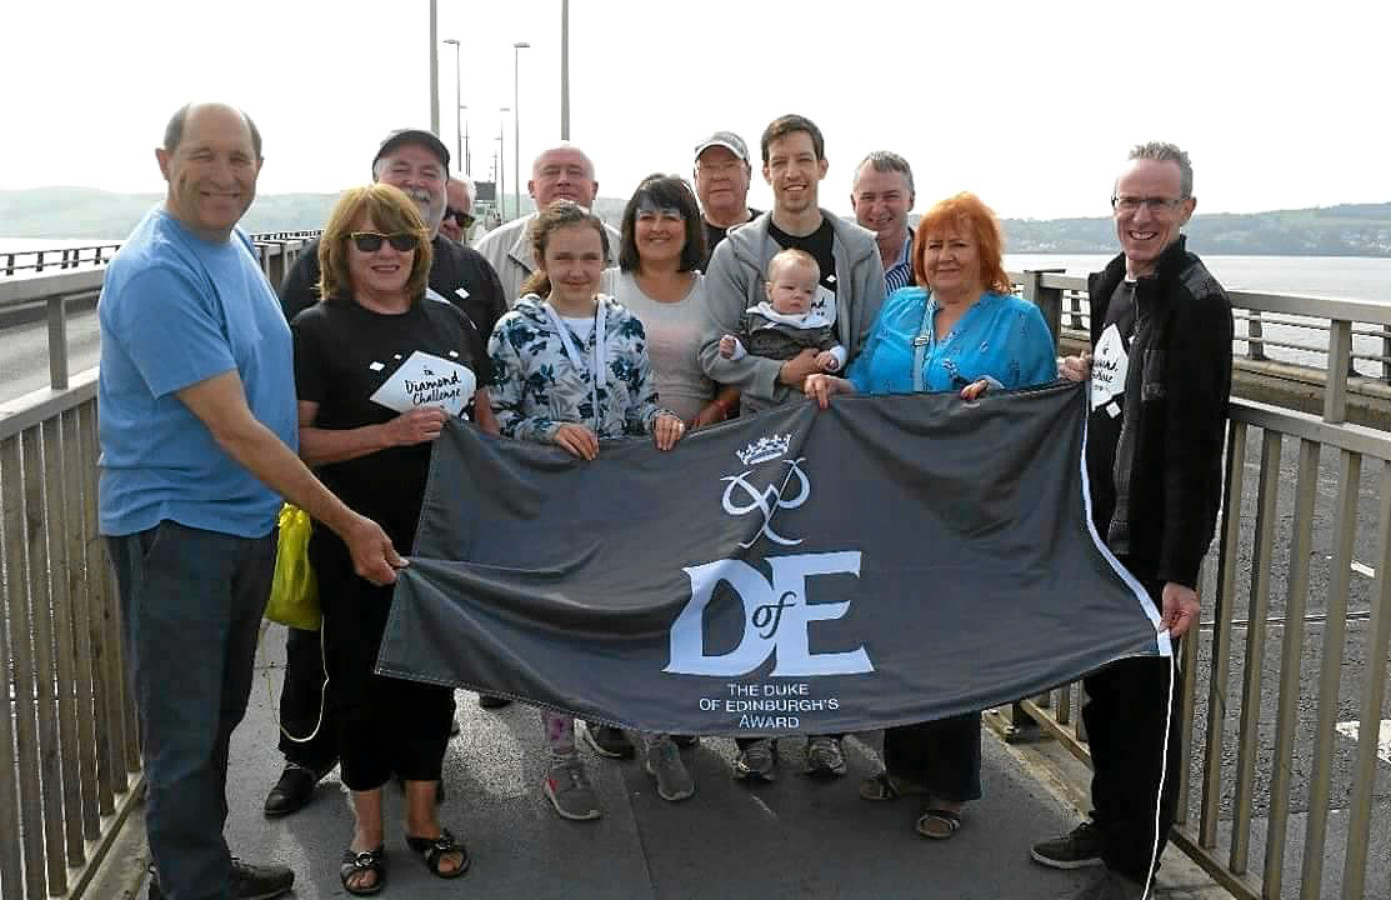 Dundee City Councillors cross Tay Bridge for Duke of Edinburgh awards.